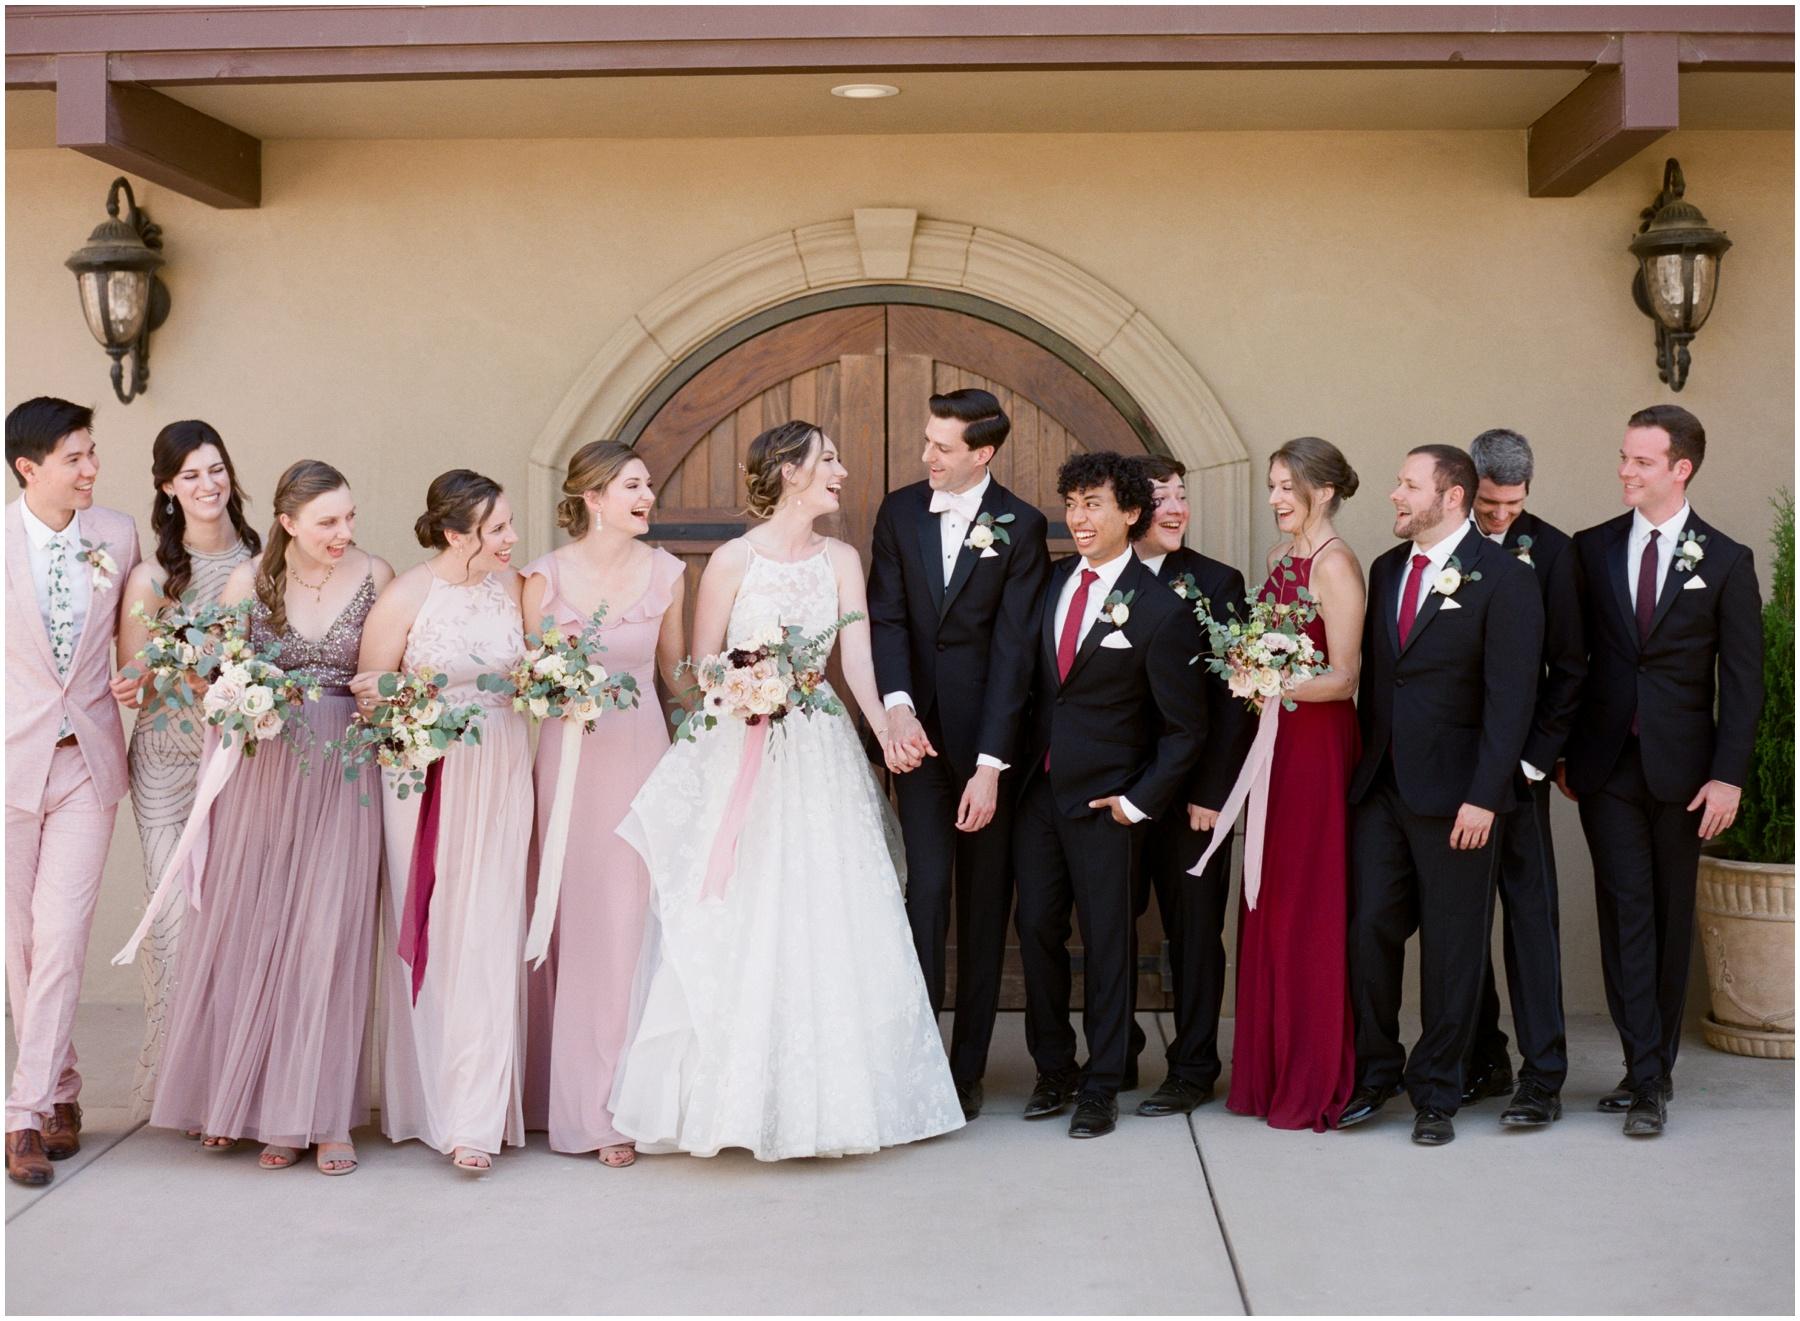 Scribner-bend-vineyards-wedding-sacramento-california-Kristine-Herman-Photography-101.jpg